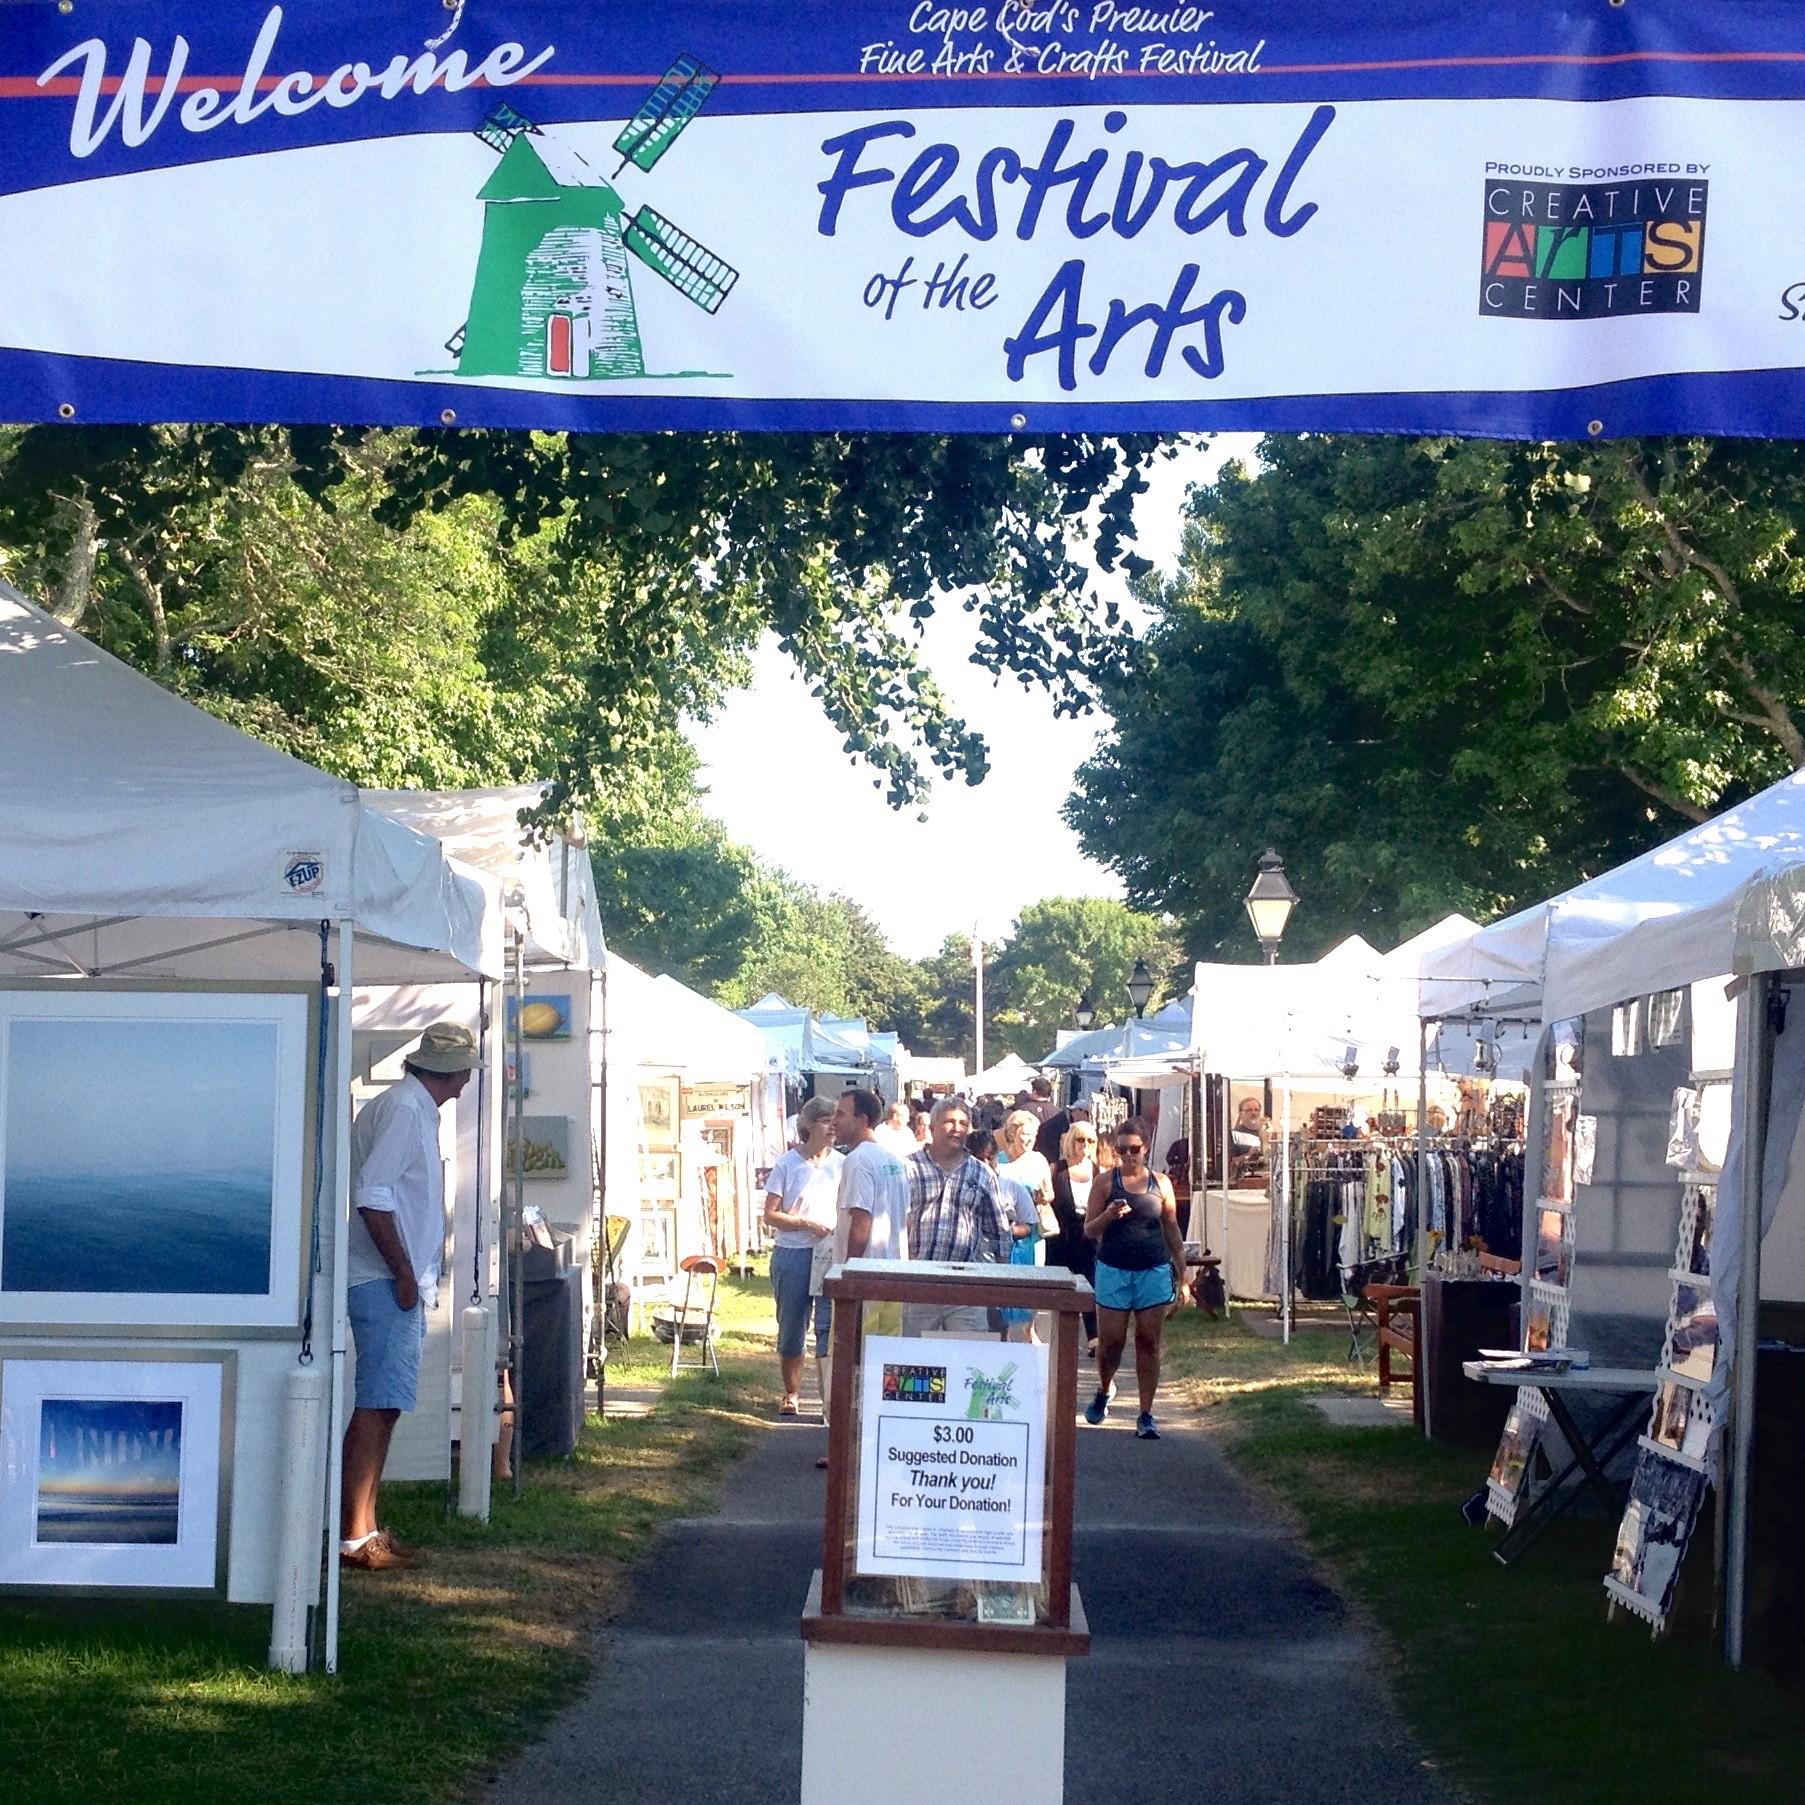 47th Annual Festival Of The Arts Creative Arts Center In Chatham At Creative Arts Center Chatham Ma Visual Arts